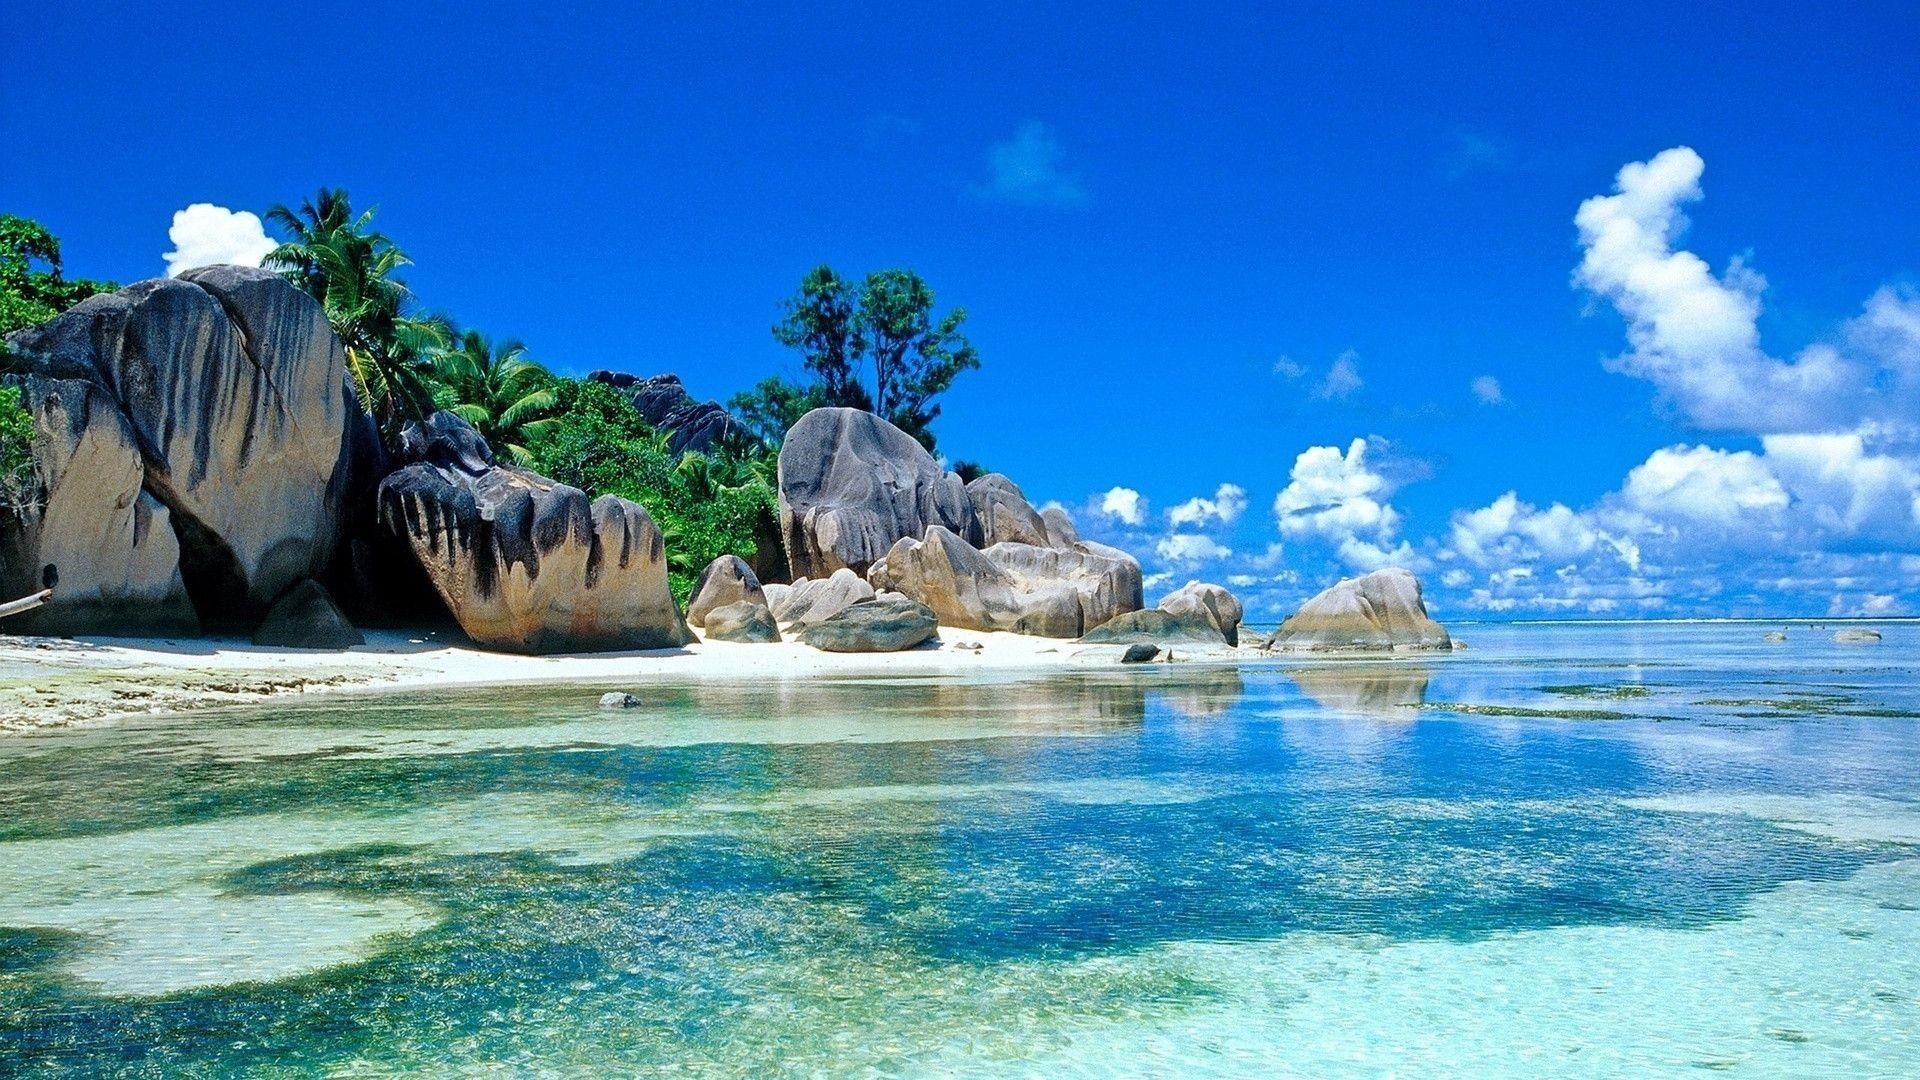 1920x1080 beautiful tropical beach hd wallpaper 1920aƒ 1080 imgstocks com